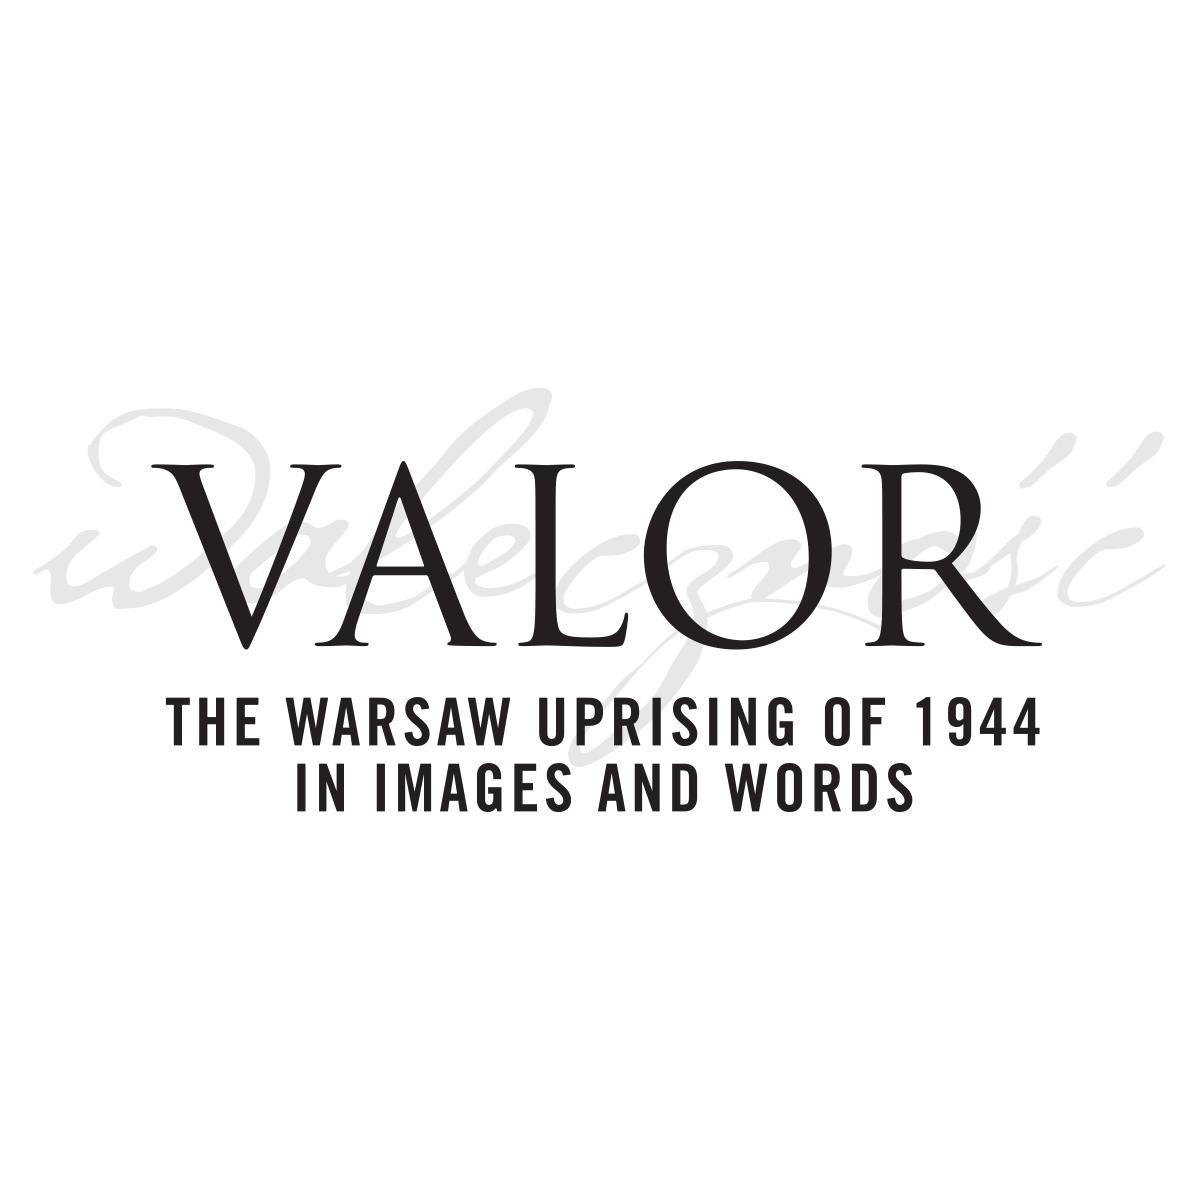 Valor, Warsaw Uprising Exhibition